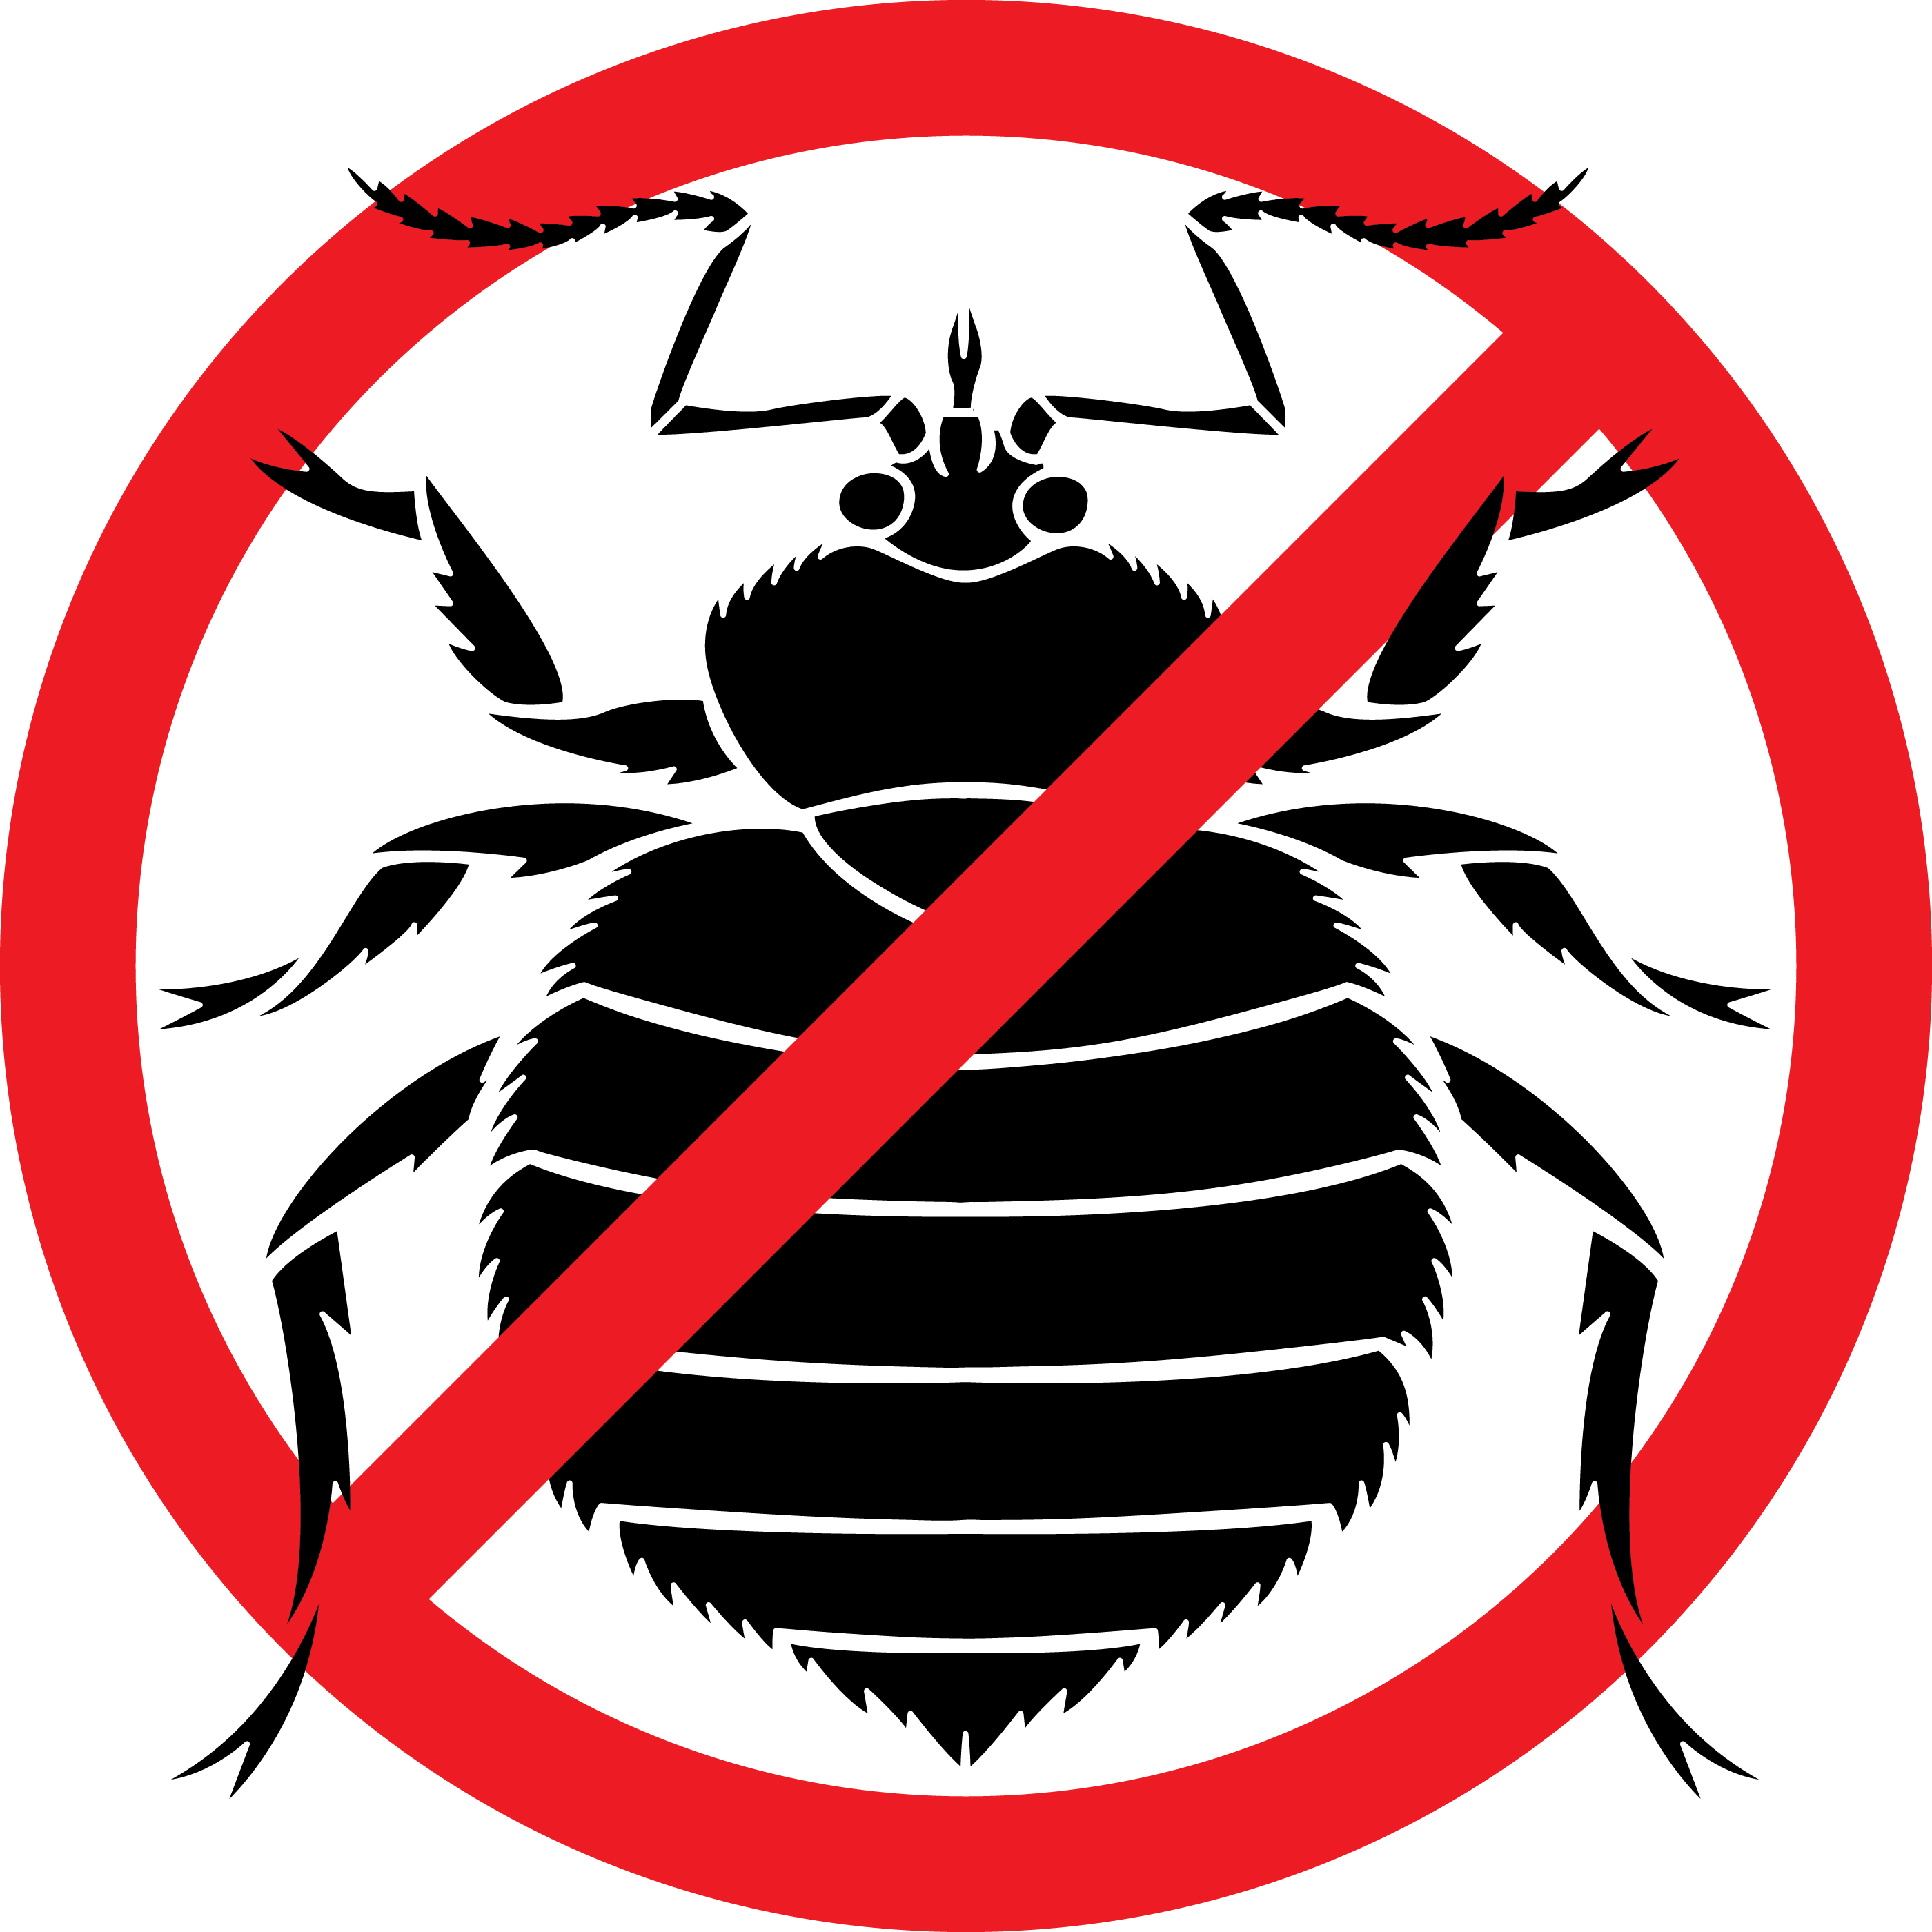 No Bedbugs